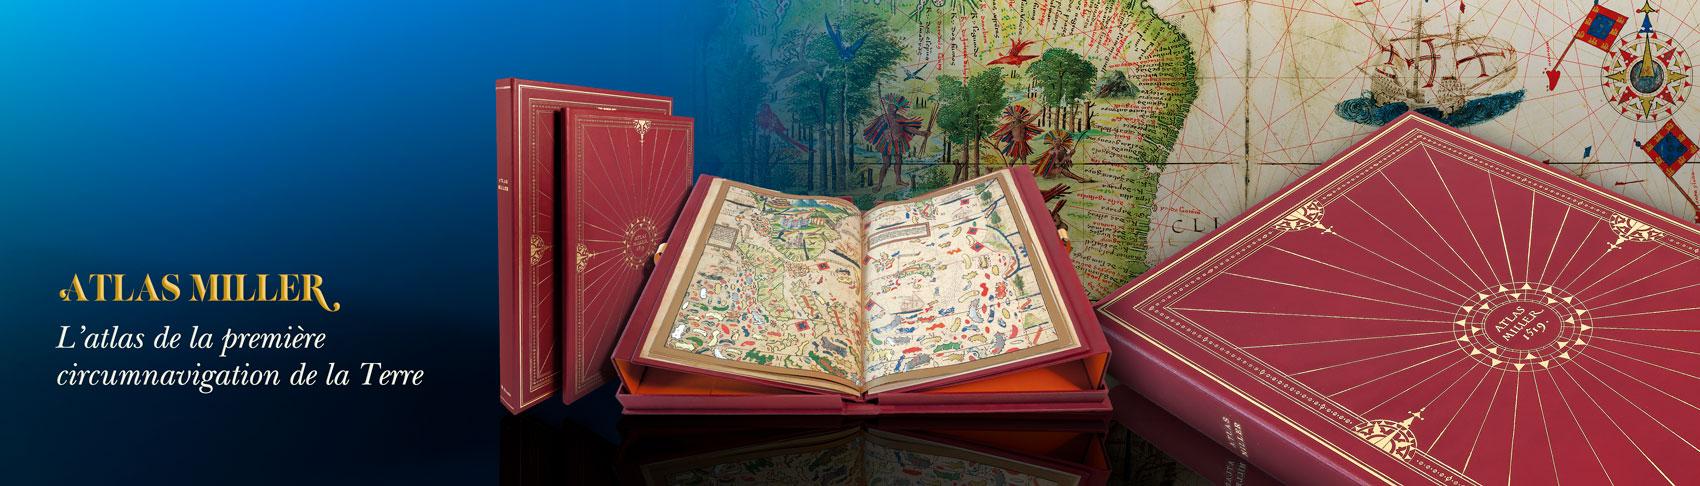 L?atlas de la première circumnavigation de la Terre